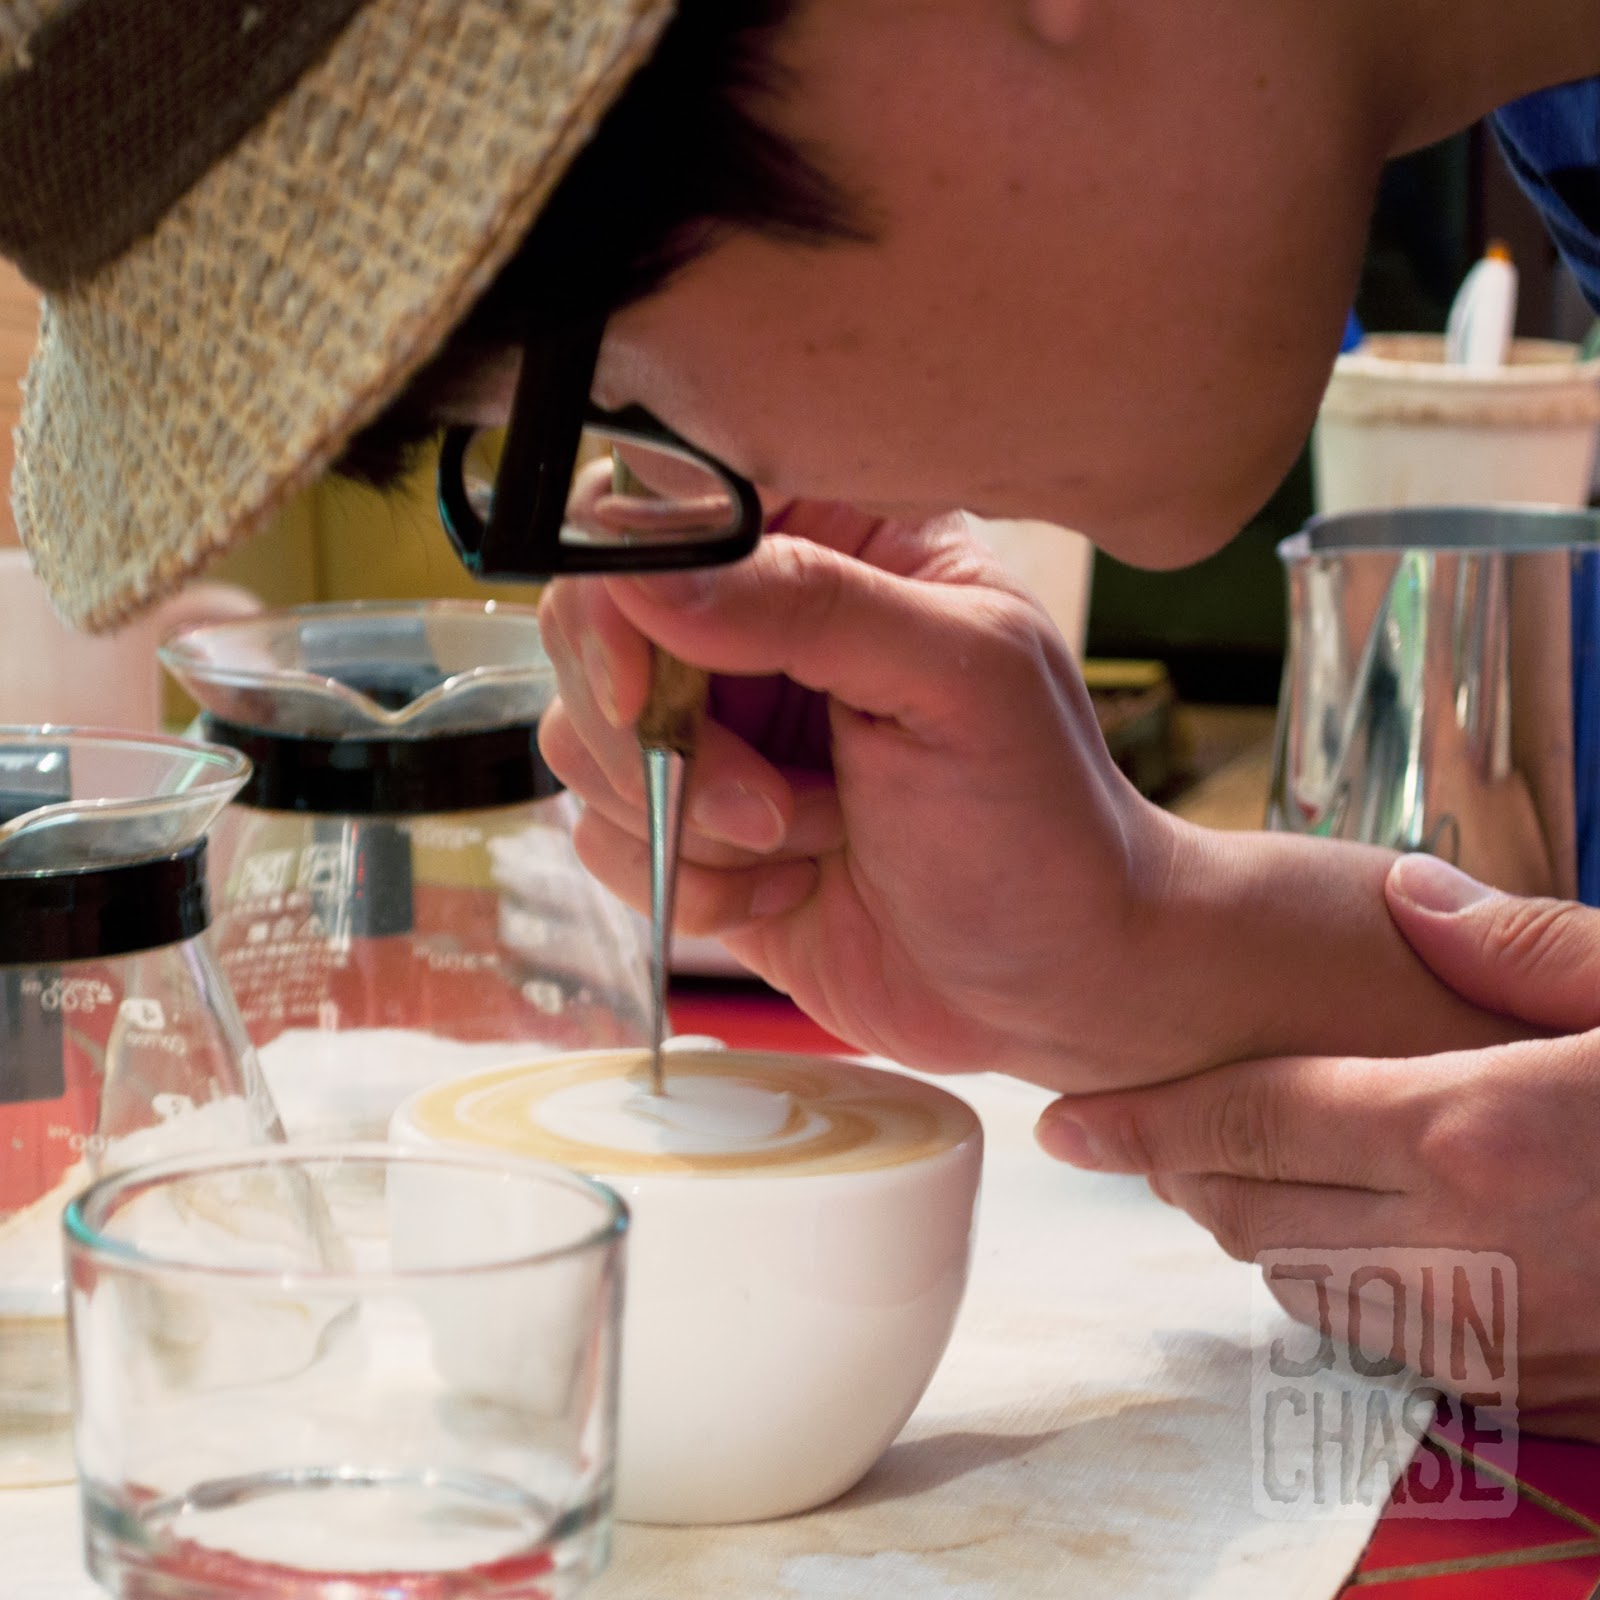 A Korean man making latte art in Ochang, South Korea.